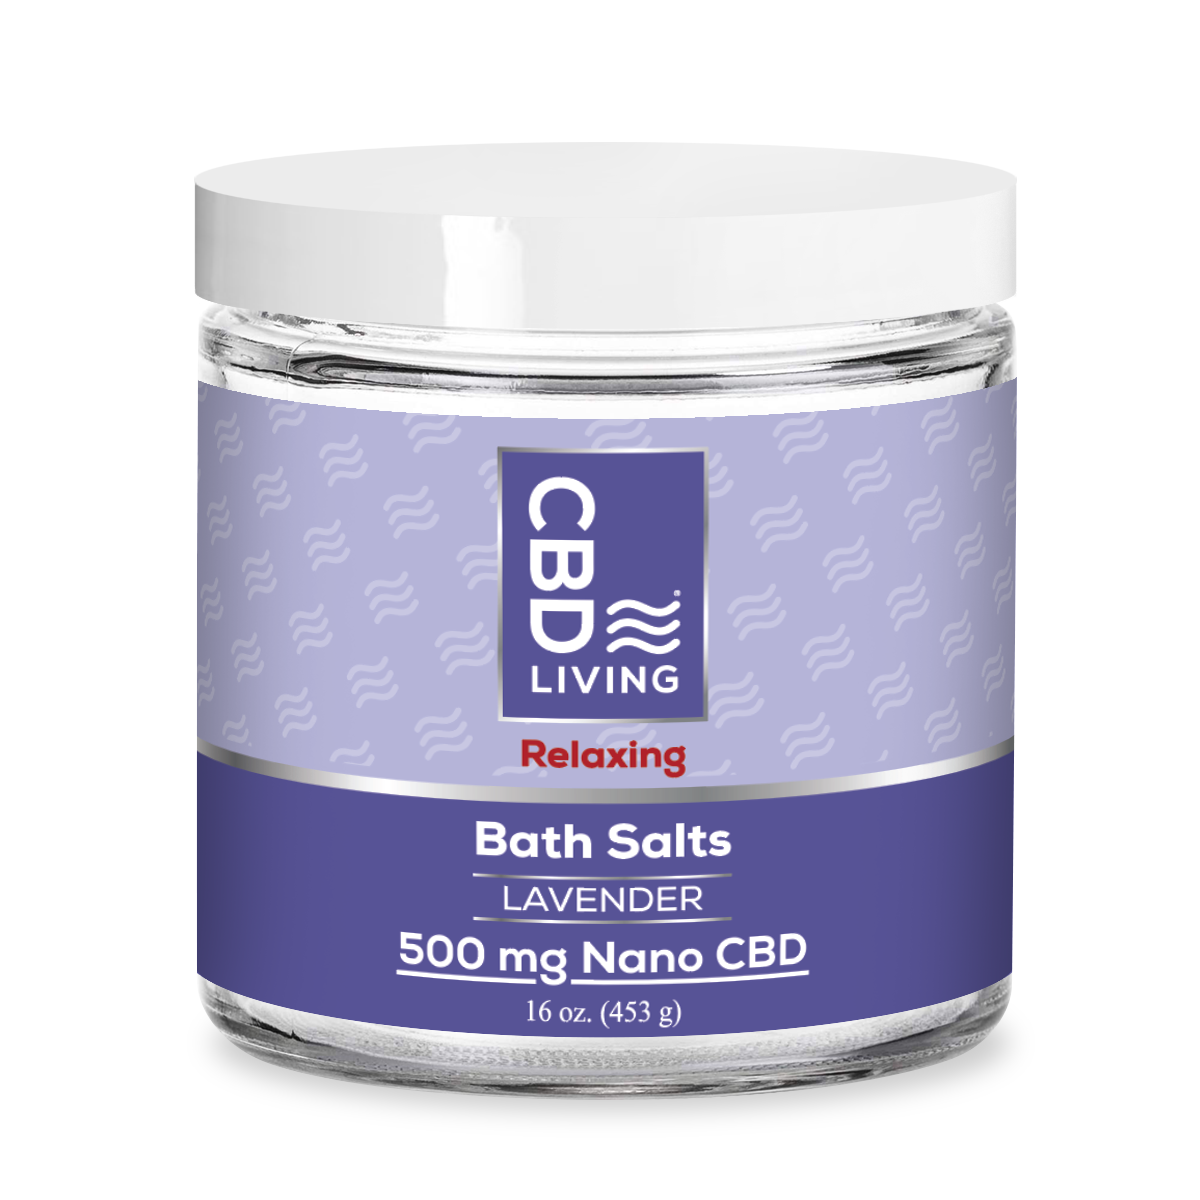 CBDL Lavender Bath Salts 500mg